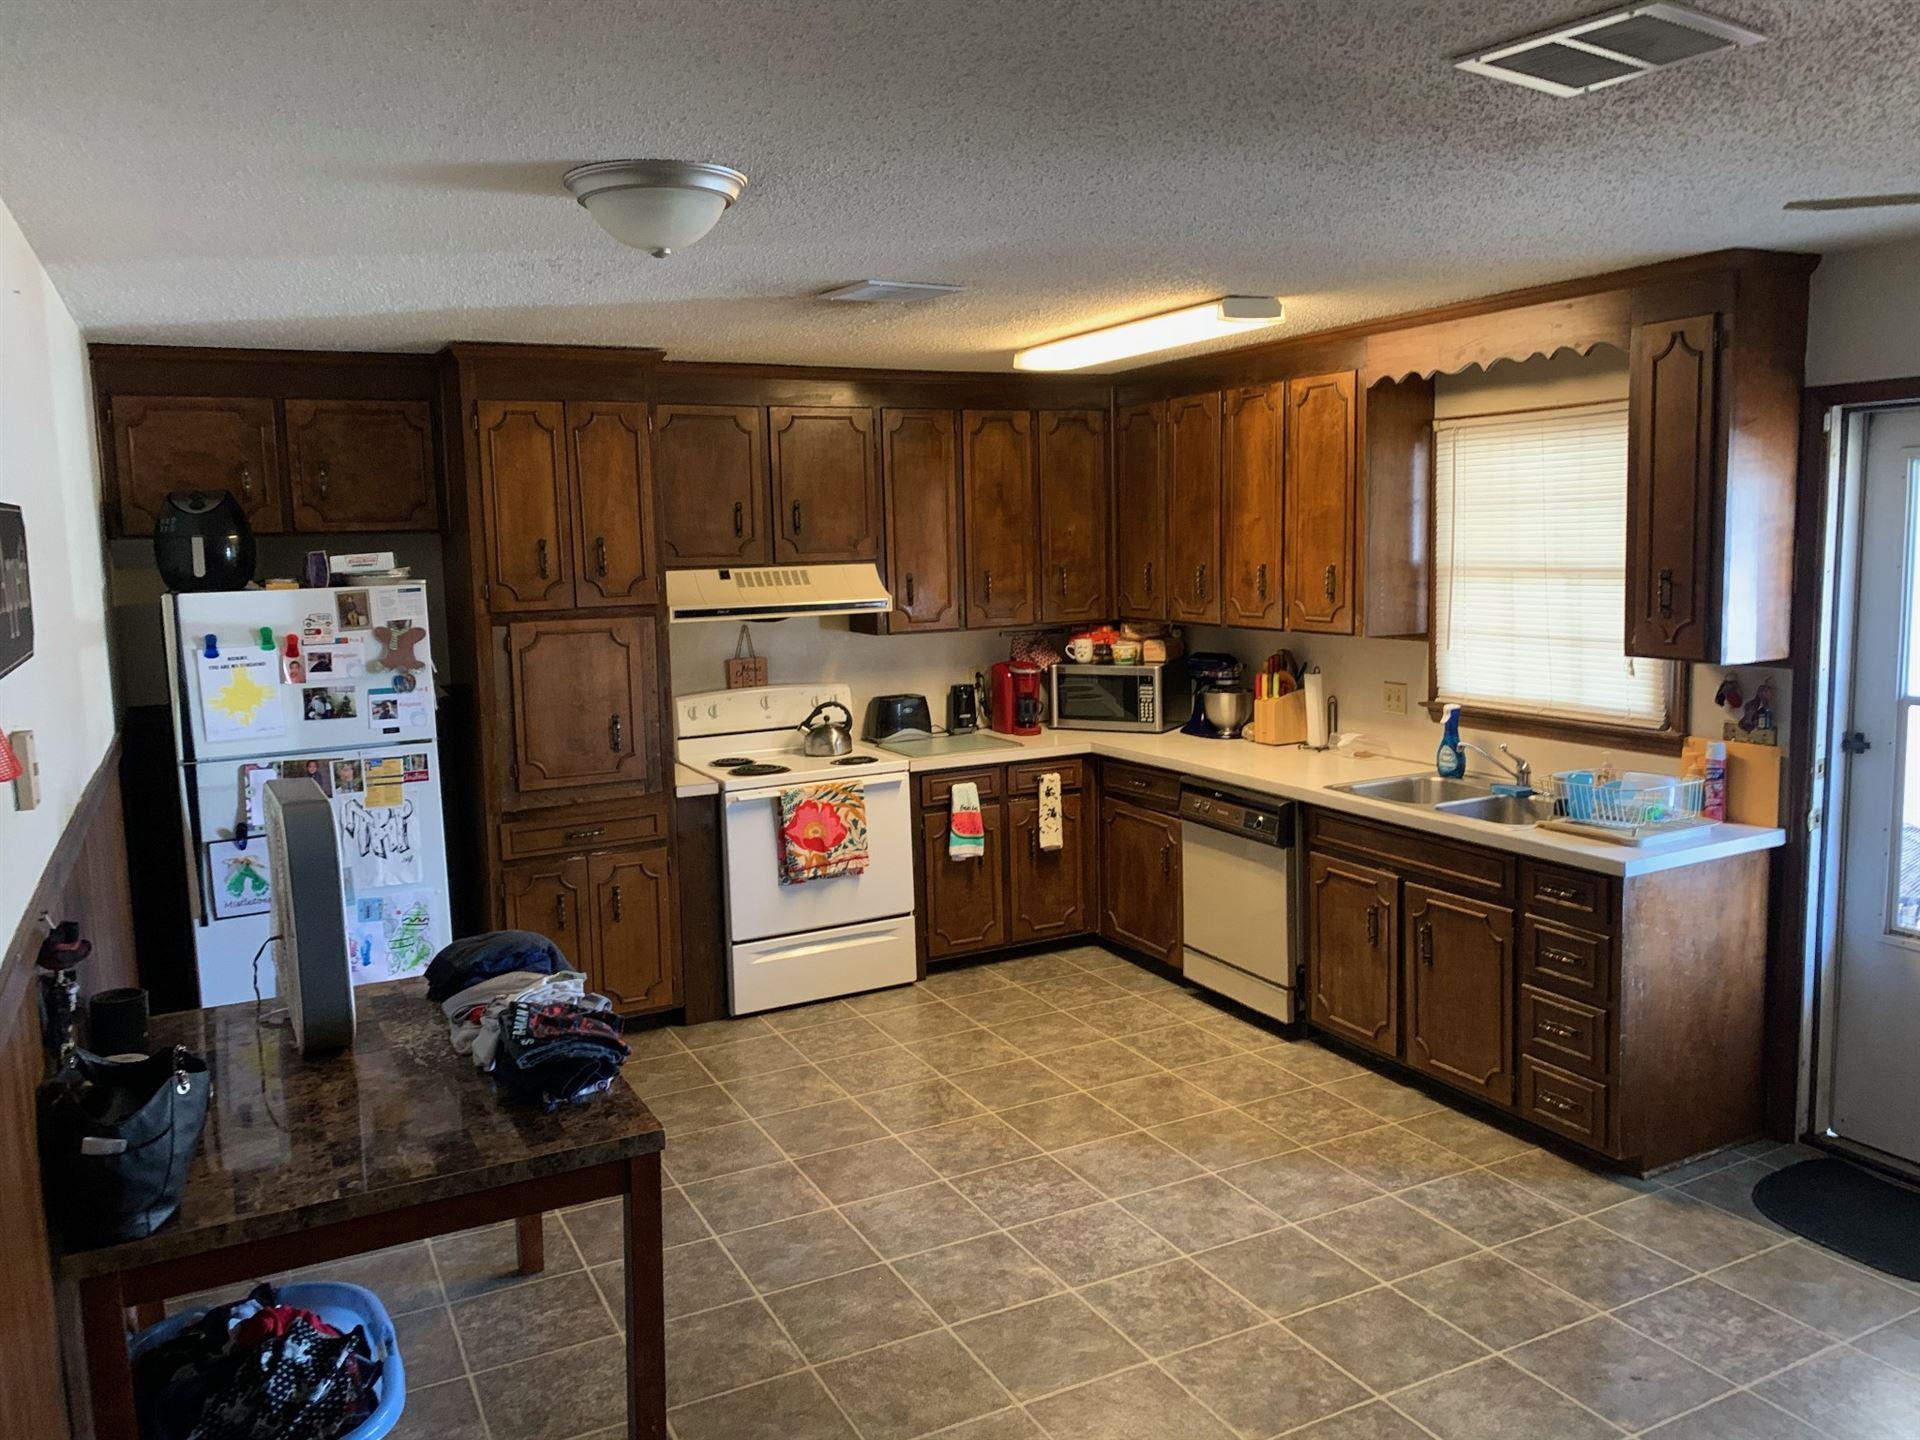 Photo of 606 E Northfield Blvd W, Murfreesboro, TN 37130 (MLS # 2232325)